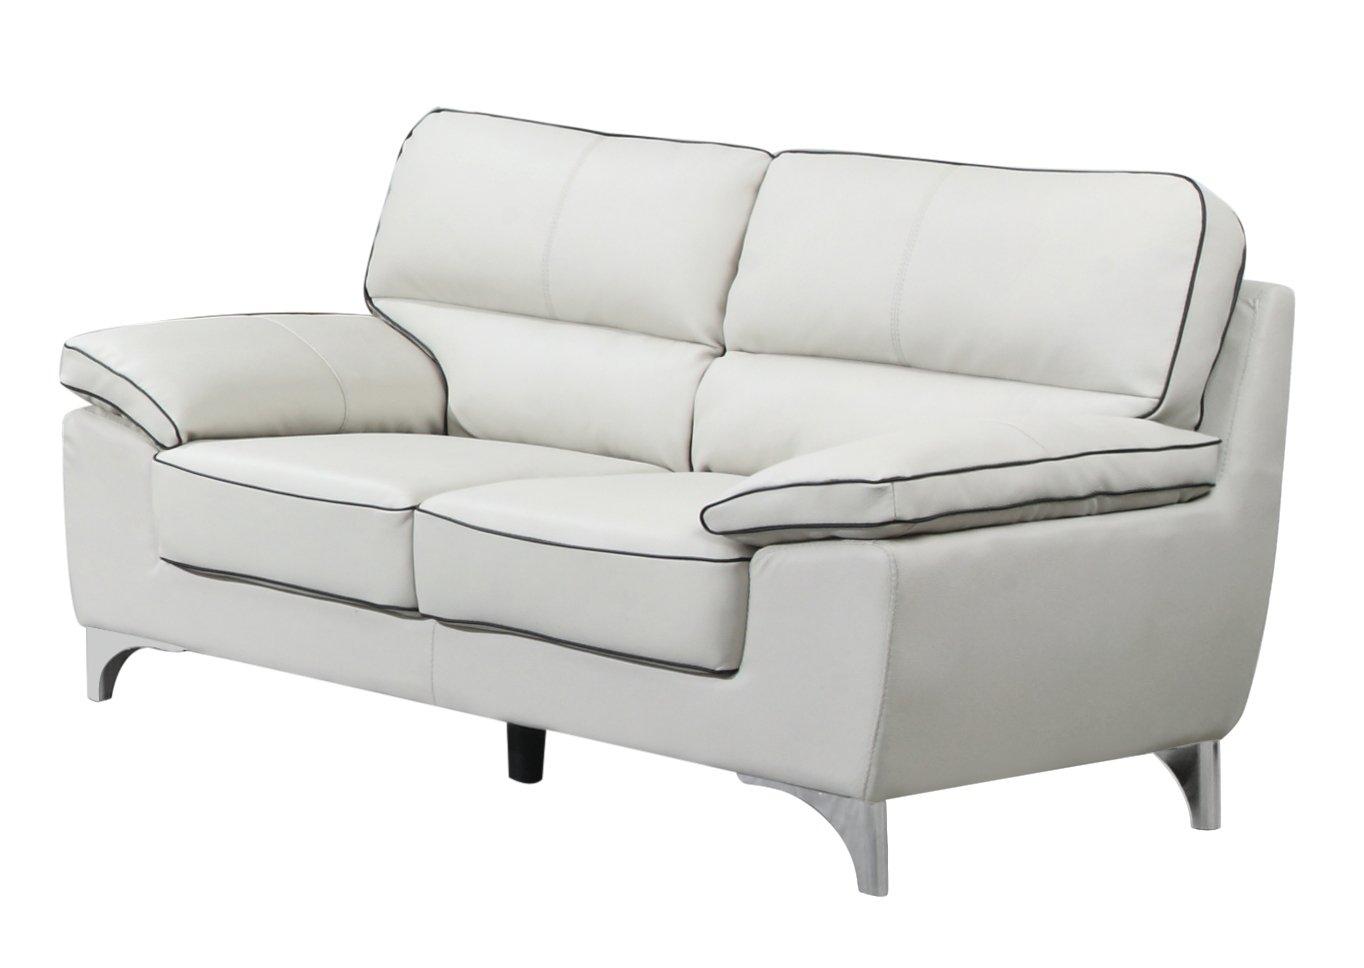 Super Blackjack Furniture 9436 Light Gray L Loveseat Leather Match Den Theyellowbook Wood Chair Design Ideas Theyellowbookinfo